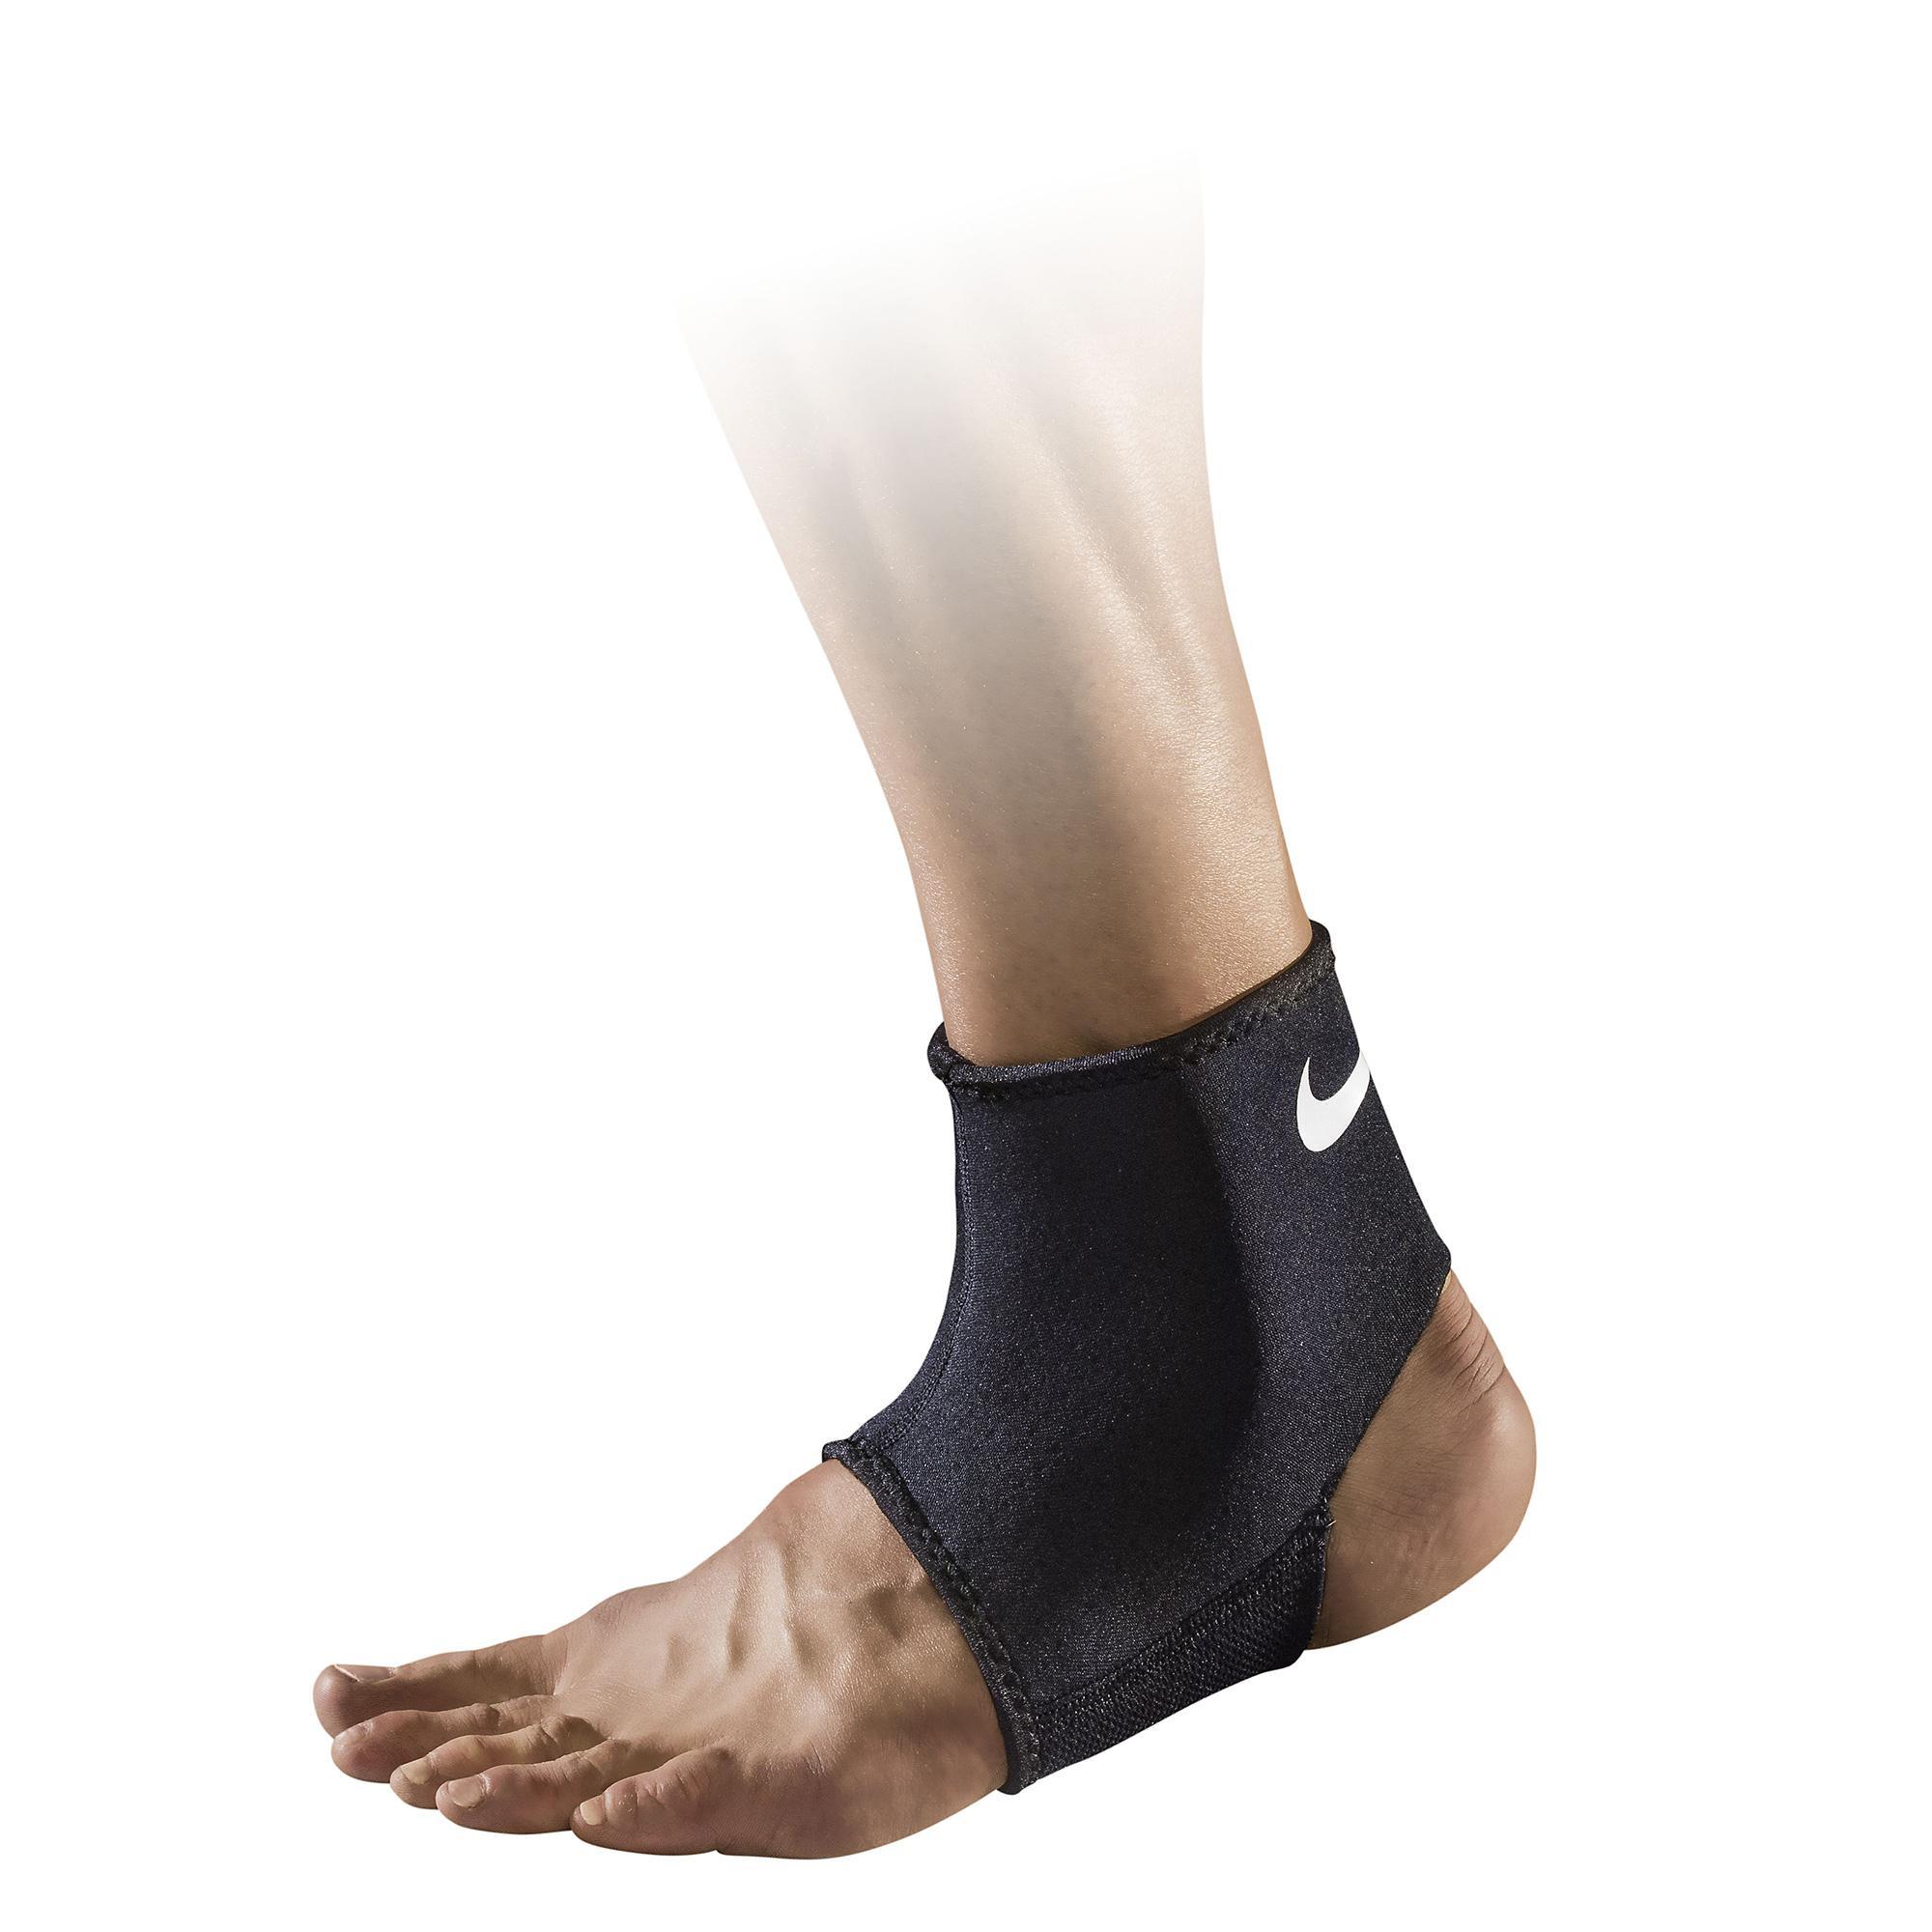 4d1c159b01 Nike Pro Ankle Sleeve 2.0 - Black - Tennisnuts.com